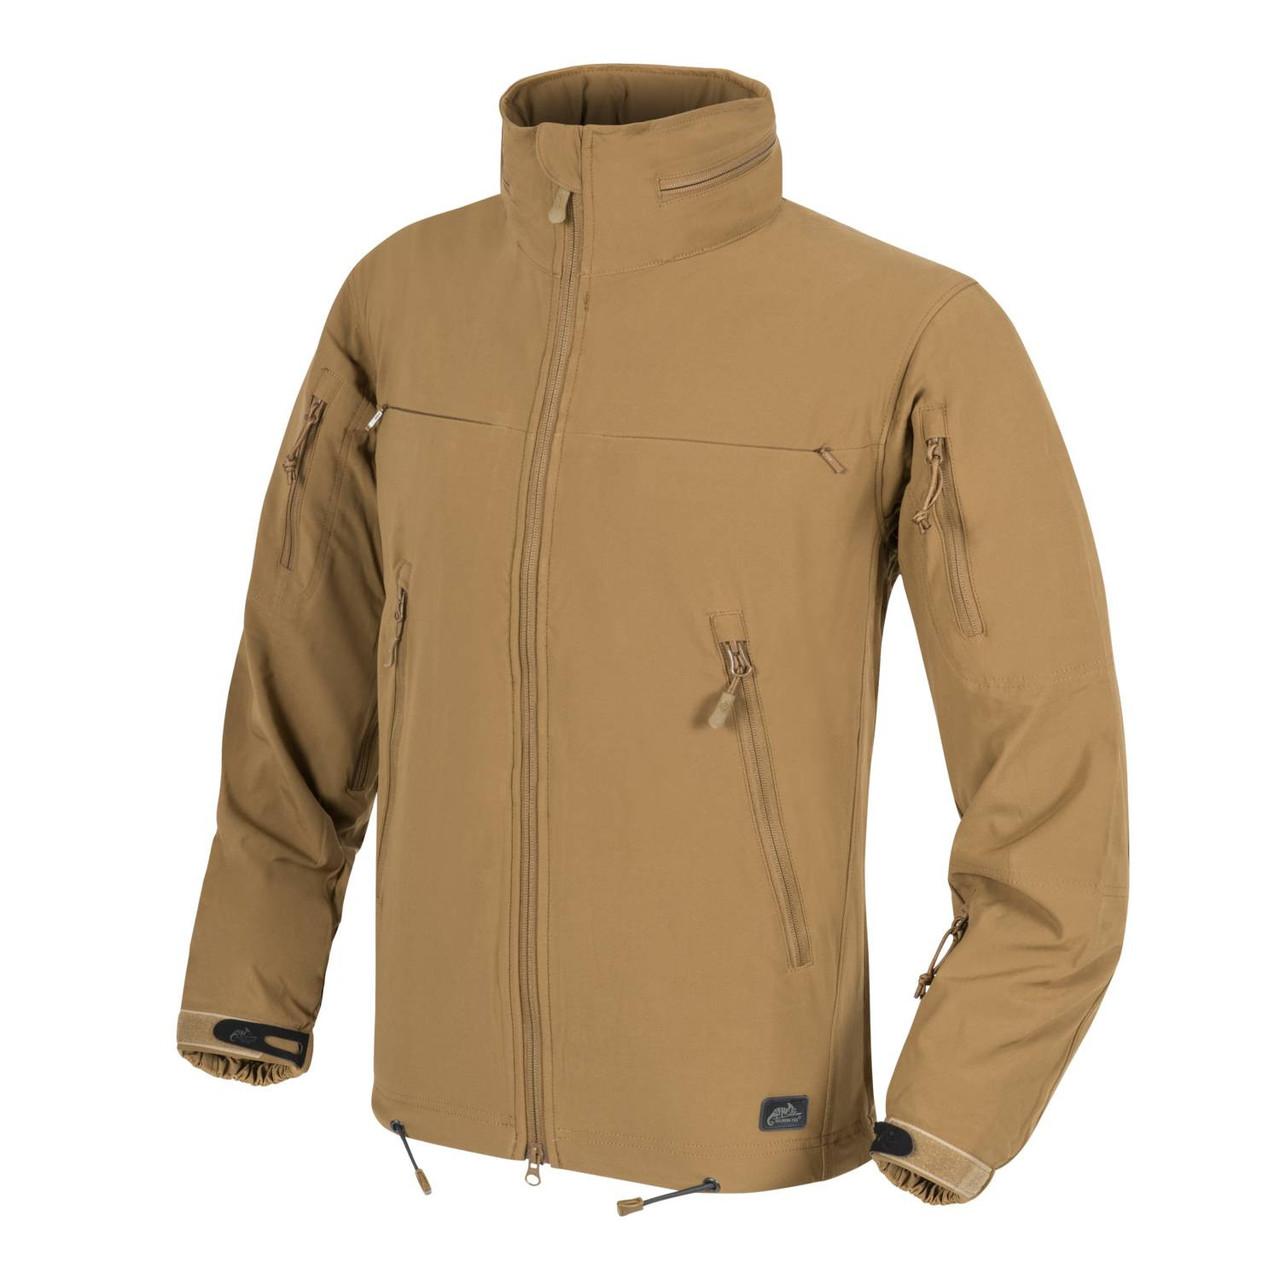 Куртка Helikon - Tex Cougar QSA™ + HID™ - Soft Shell Windblocker.